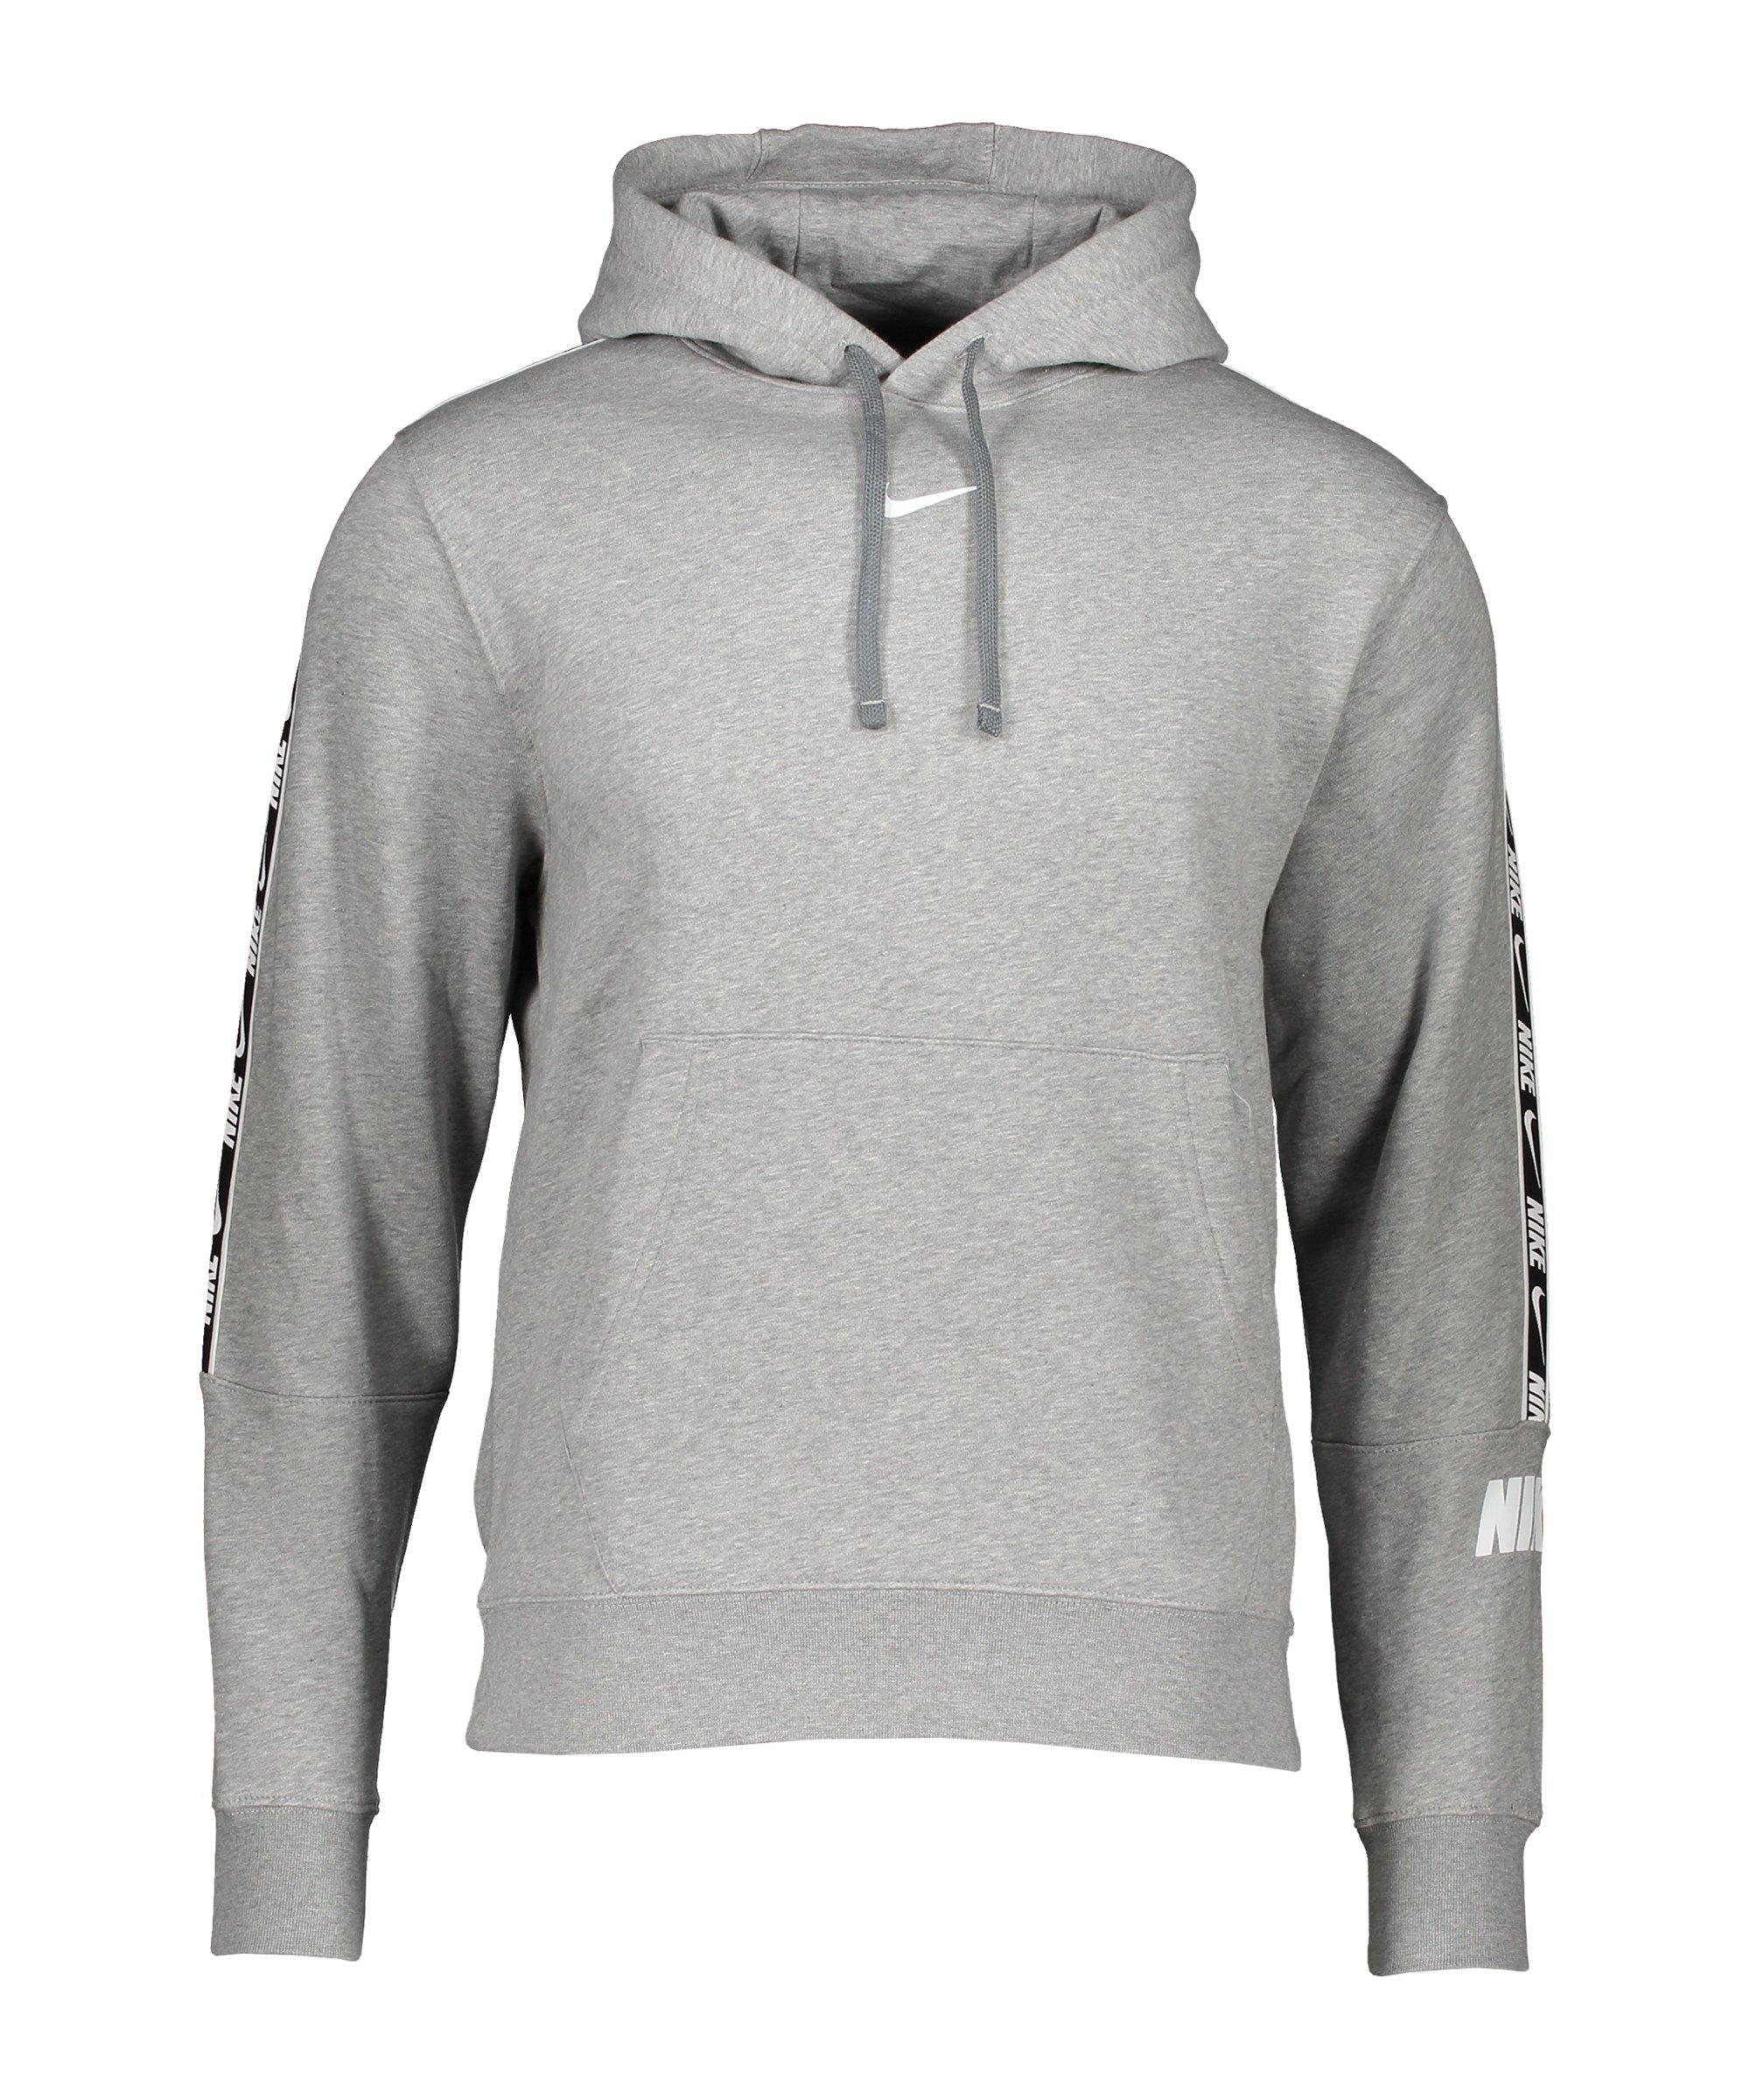 Nike Repeat Fleece Hoody Grau Weiss F063 - grau